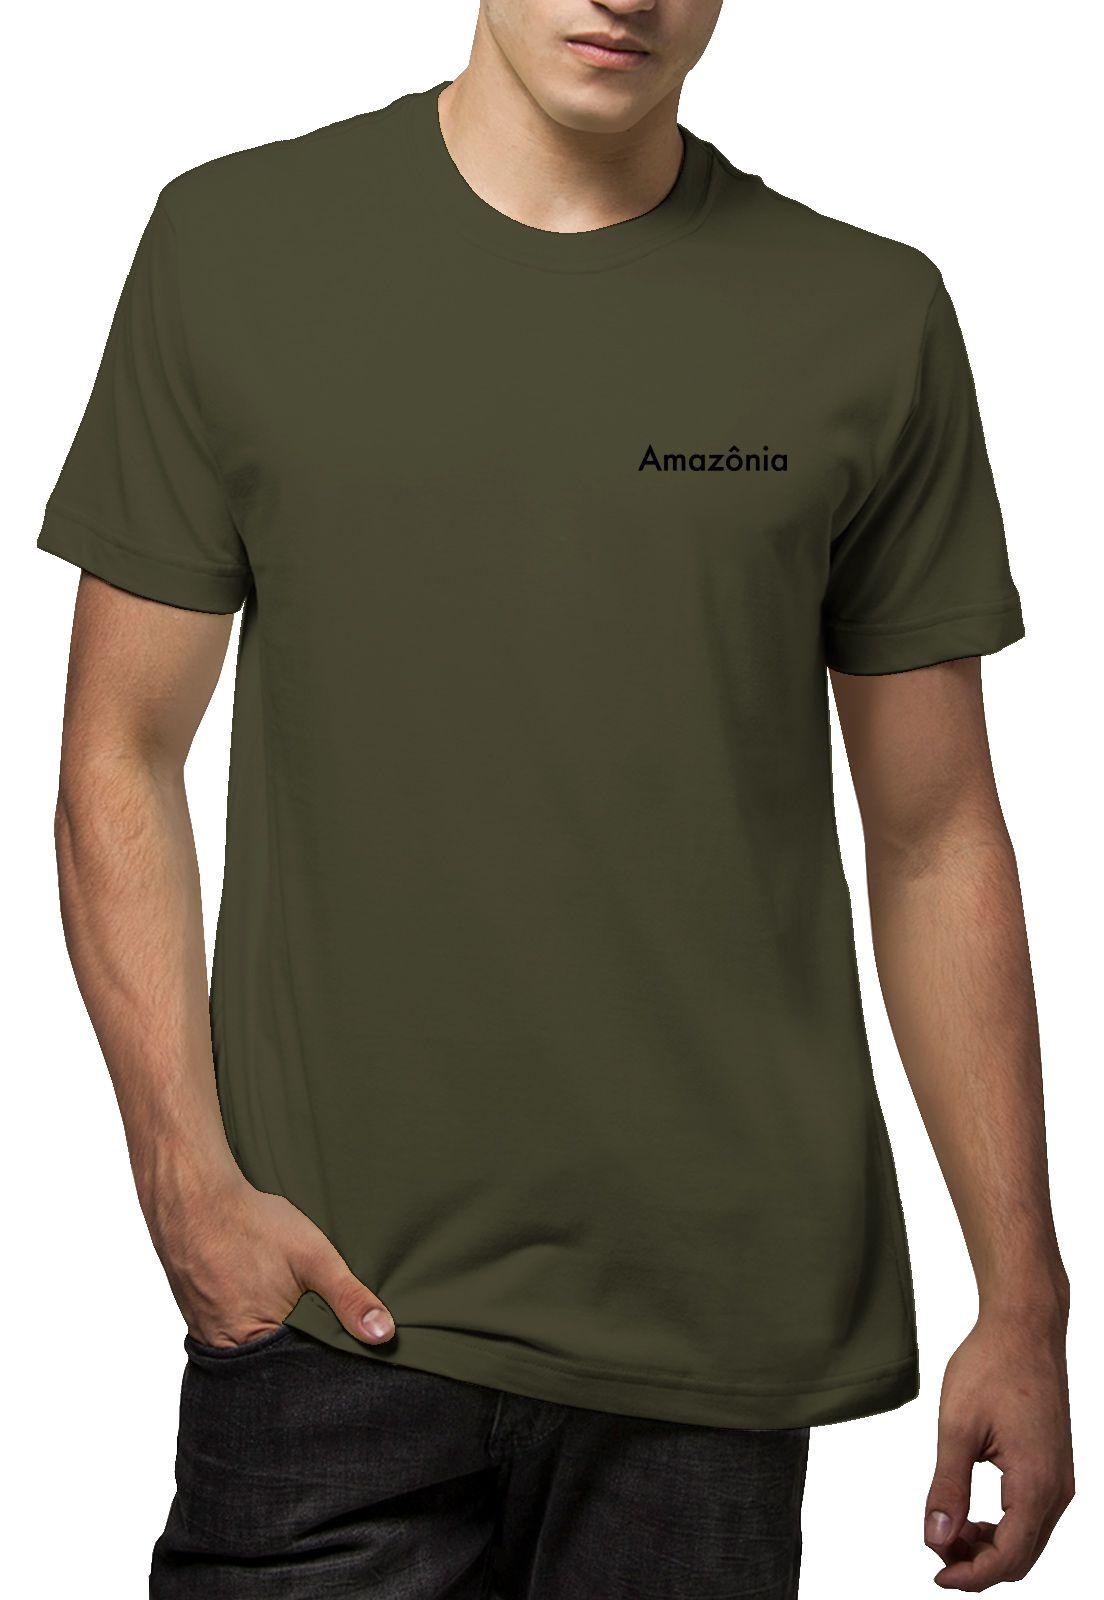 Camiseta Amazônia Logo Oficial - Verde Escuro